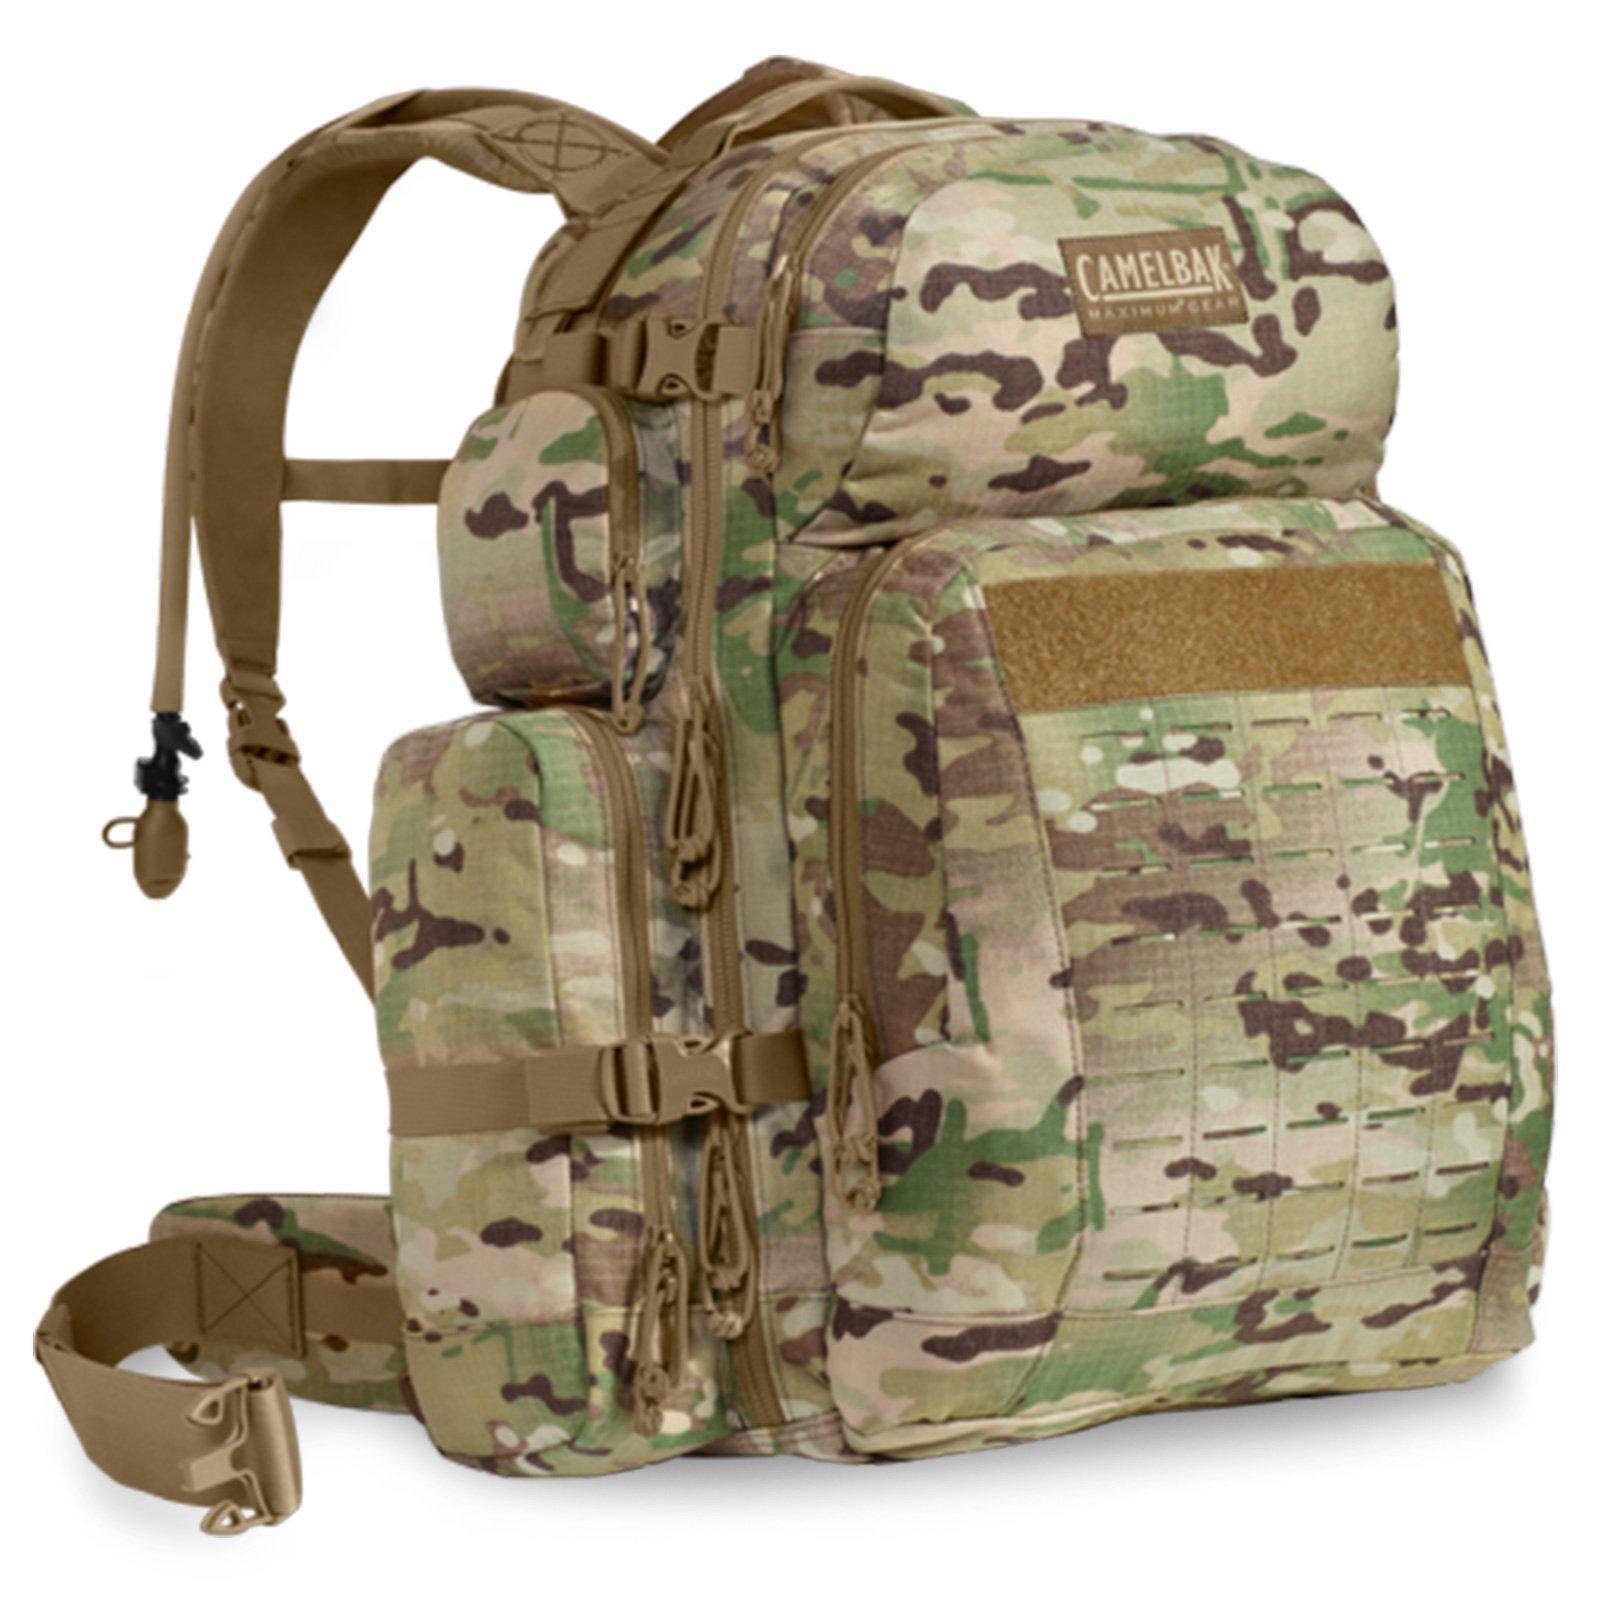 Camelbak Adult BFM Mil Spec Antidote Hydration Backpack, Multicam